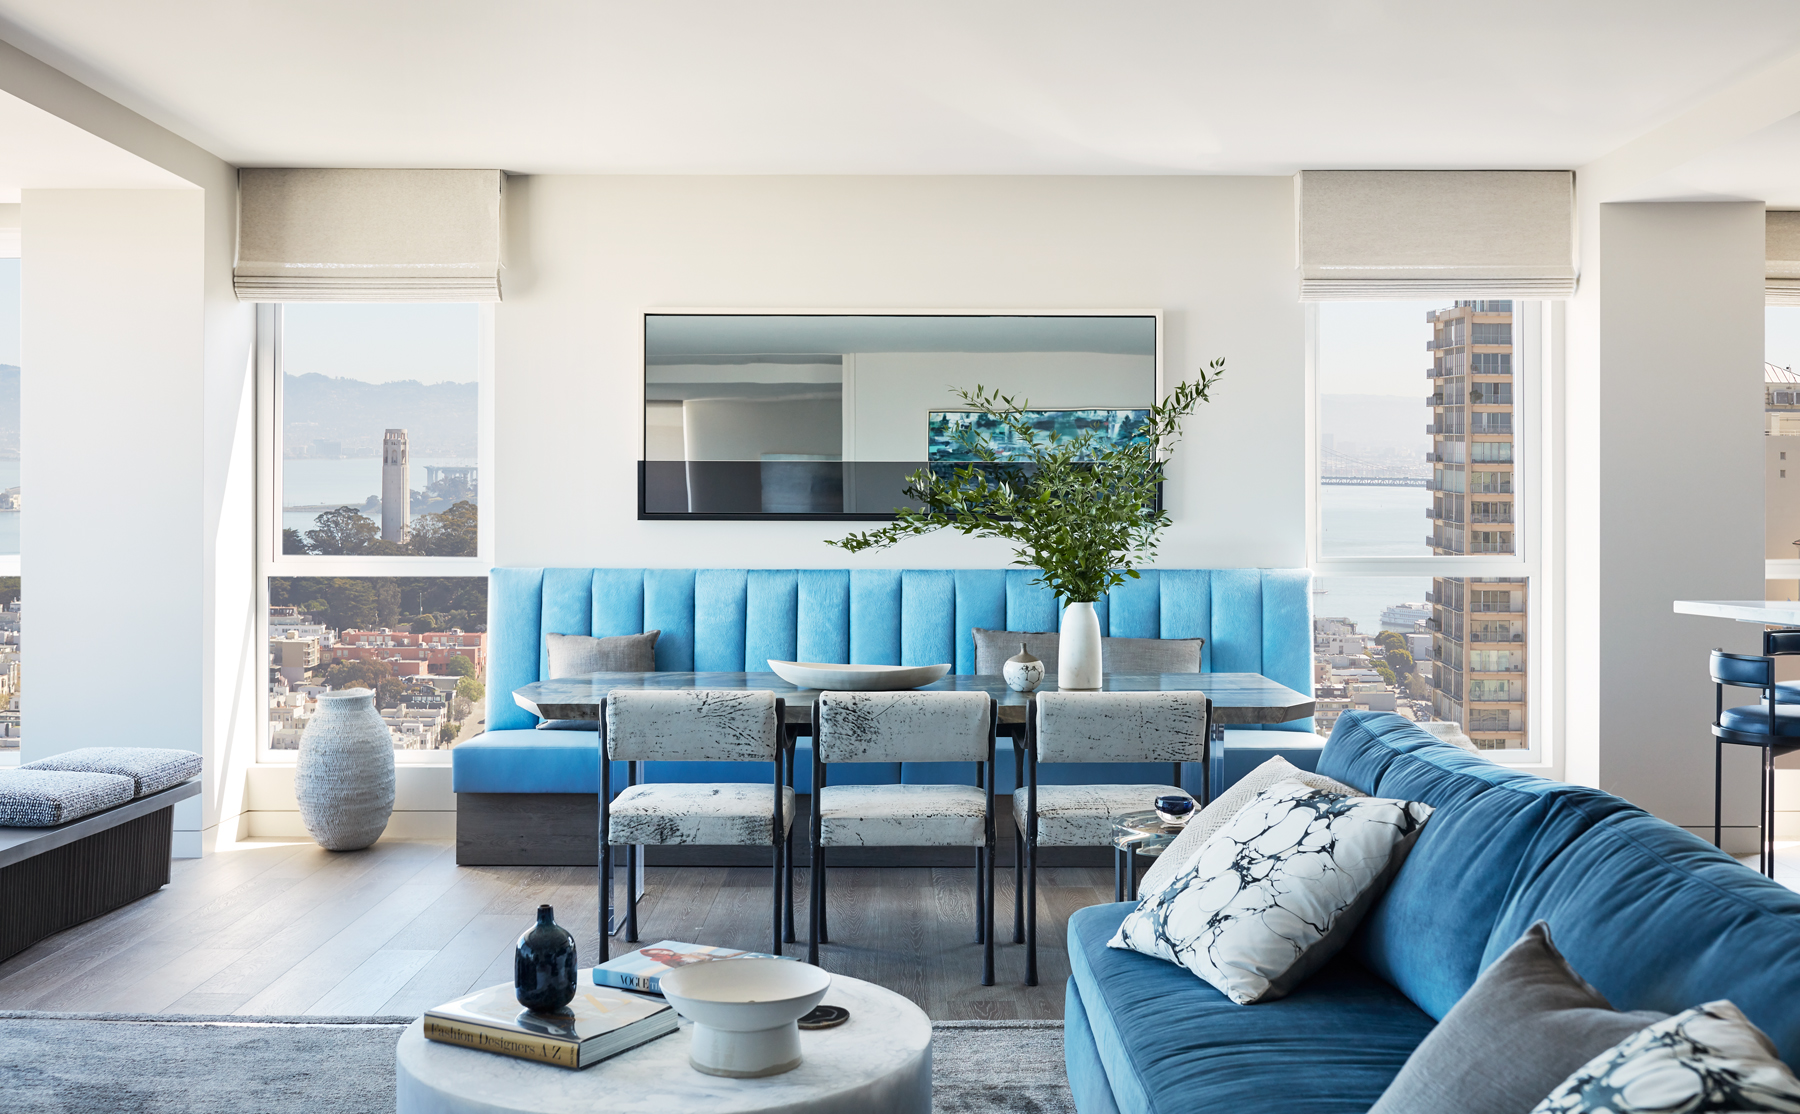 Jennifer_robins_interiors_projects_russian_hill_SF_4JRI.1070GreenSt_009_living_room_LR_eating_area